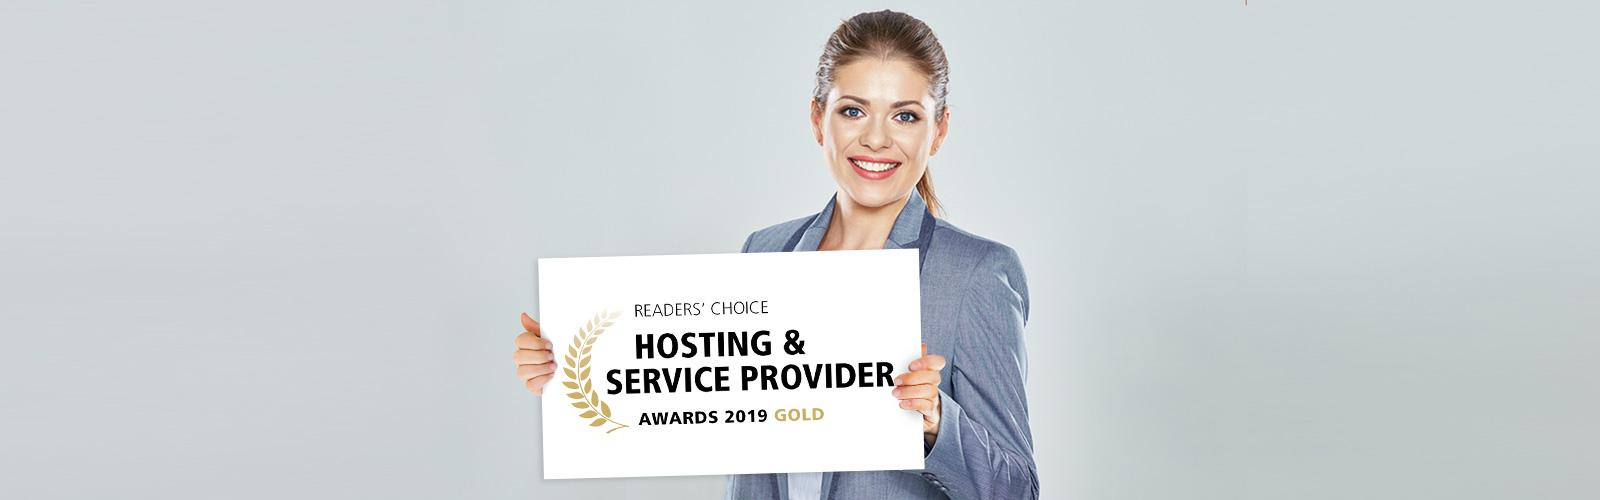 Hosting Award 2019 für united-domains